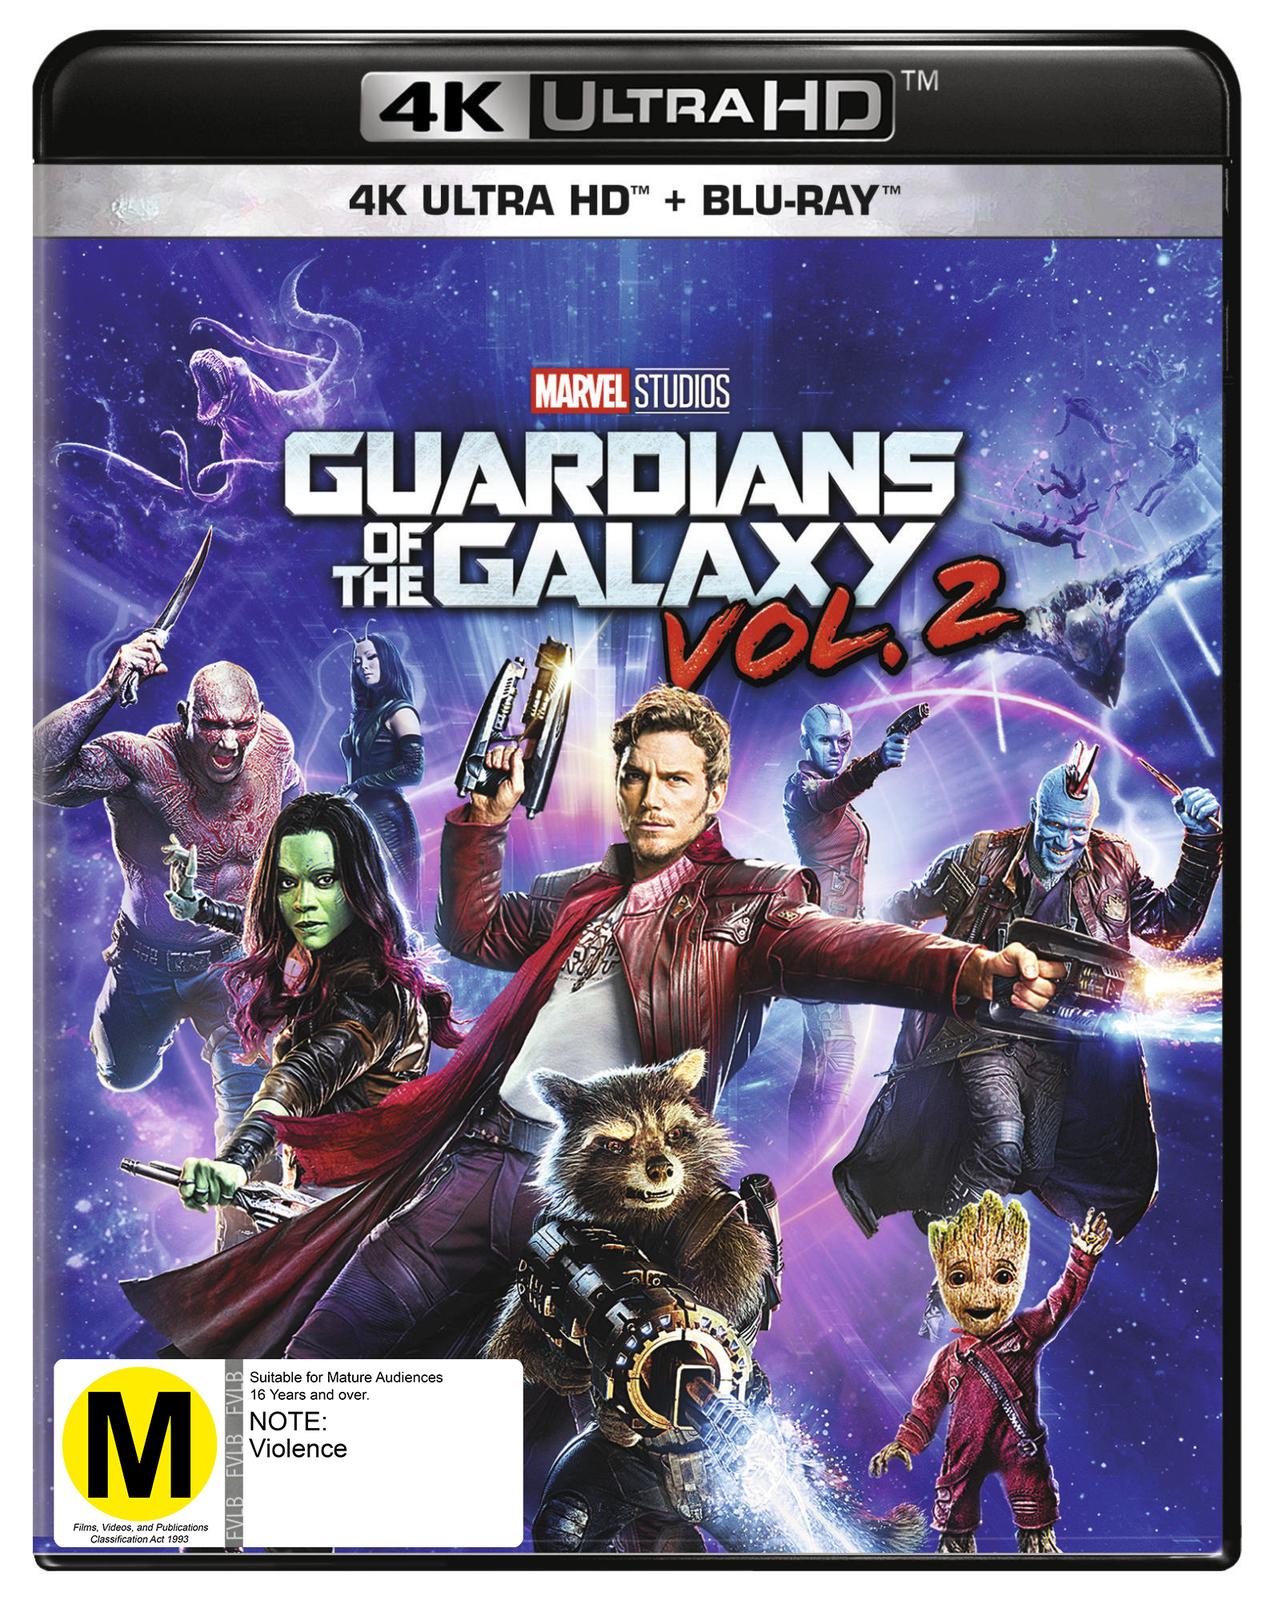 Guardians of the Galaxy Vol. 2 on Blu-ray, UHD Blu-ray image